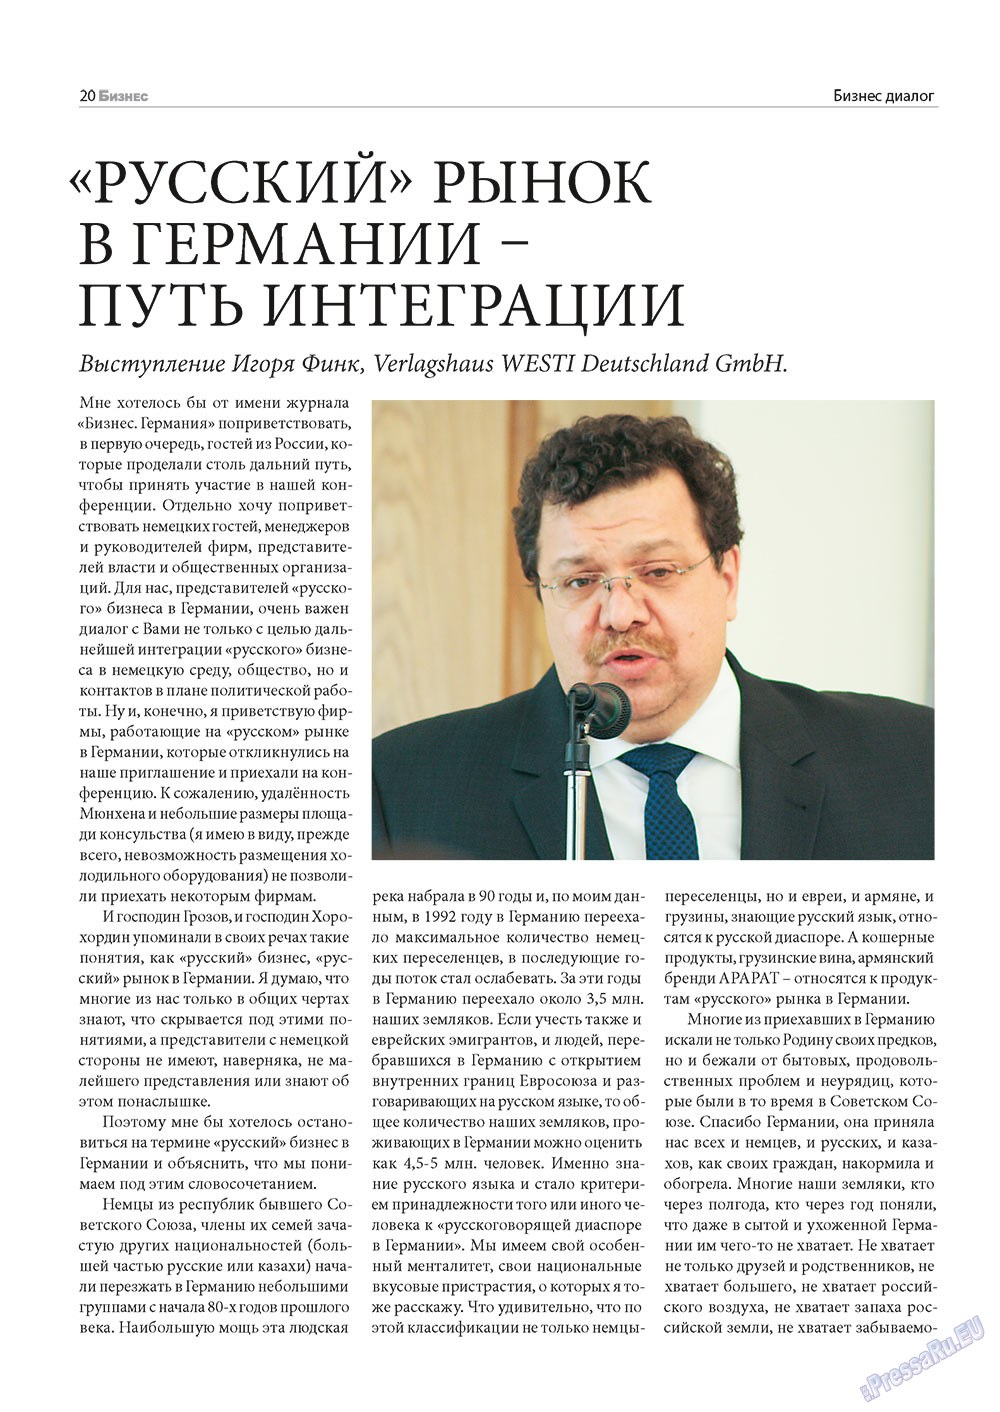 Бизнес (журнал). 2011 год, номер 6, стр. 20